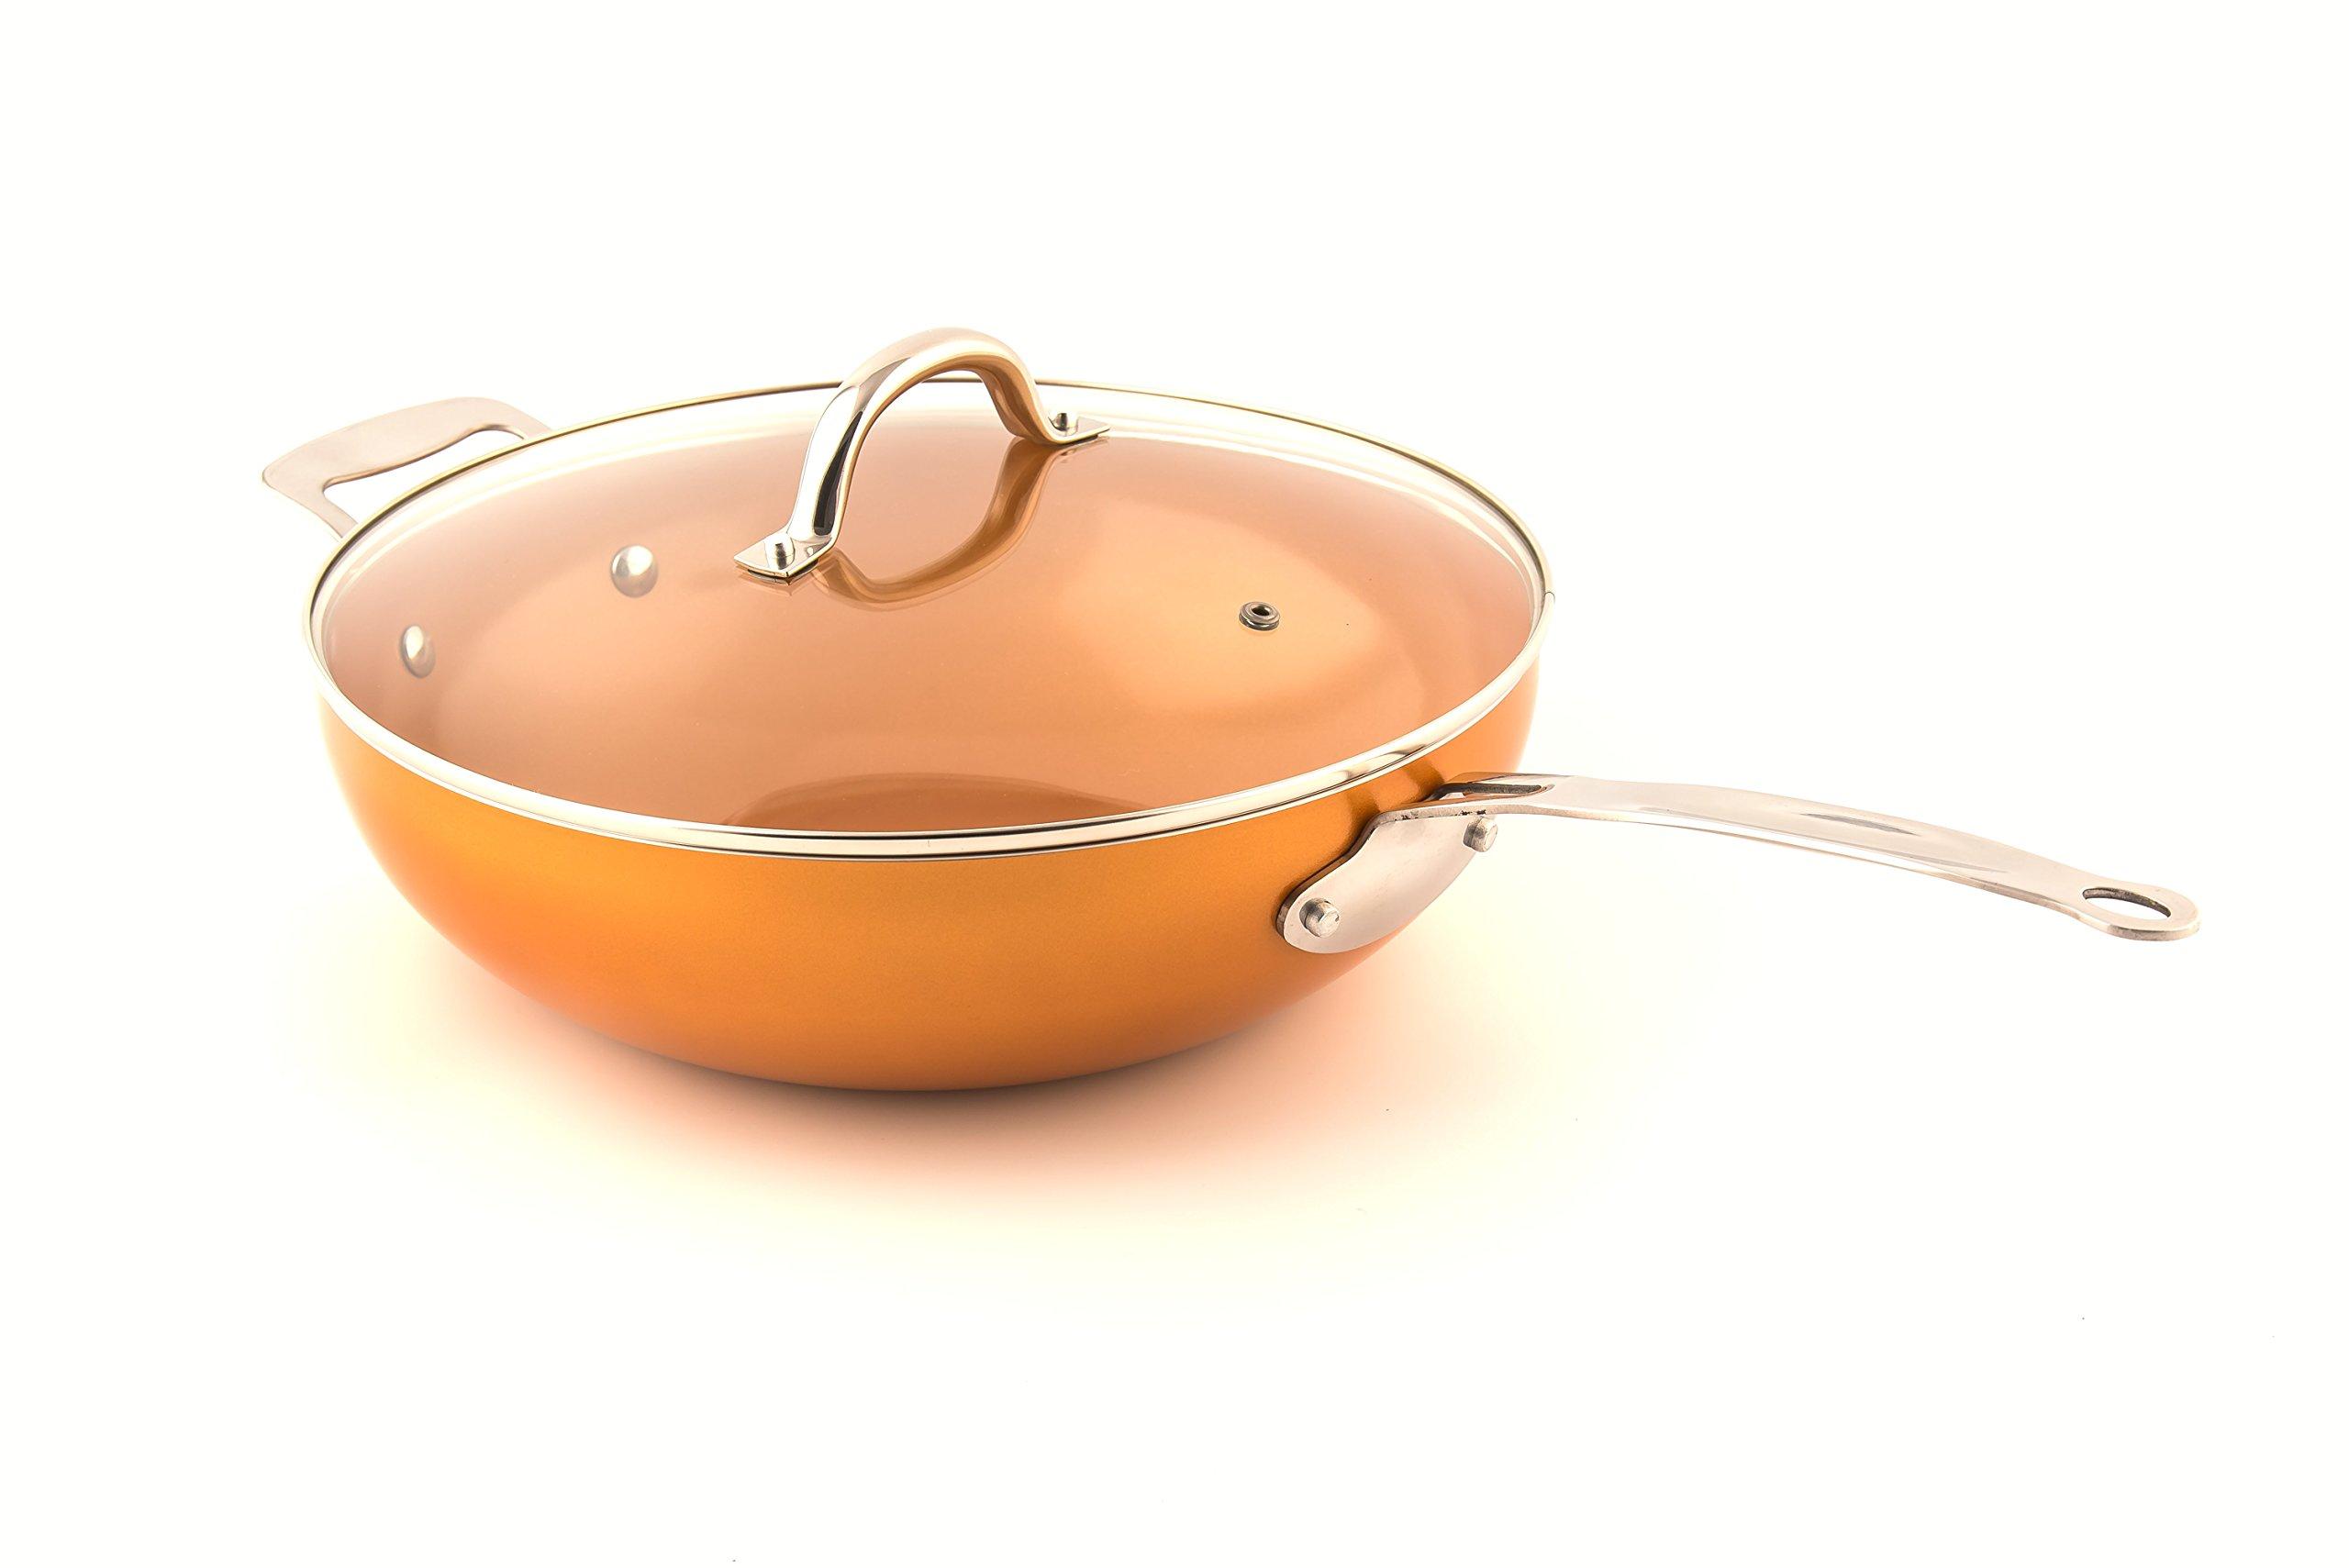 Original Copper Pan 12'' Non-Stick Wok with Lid